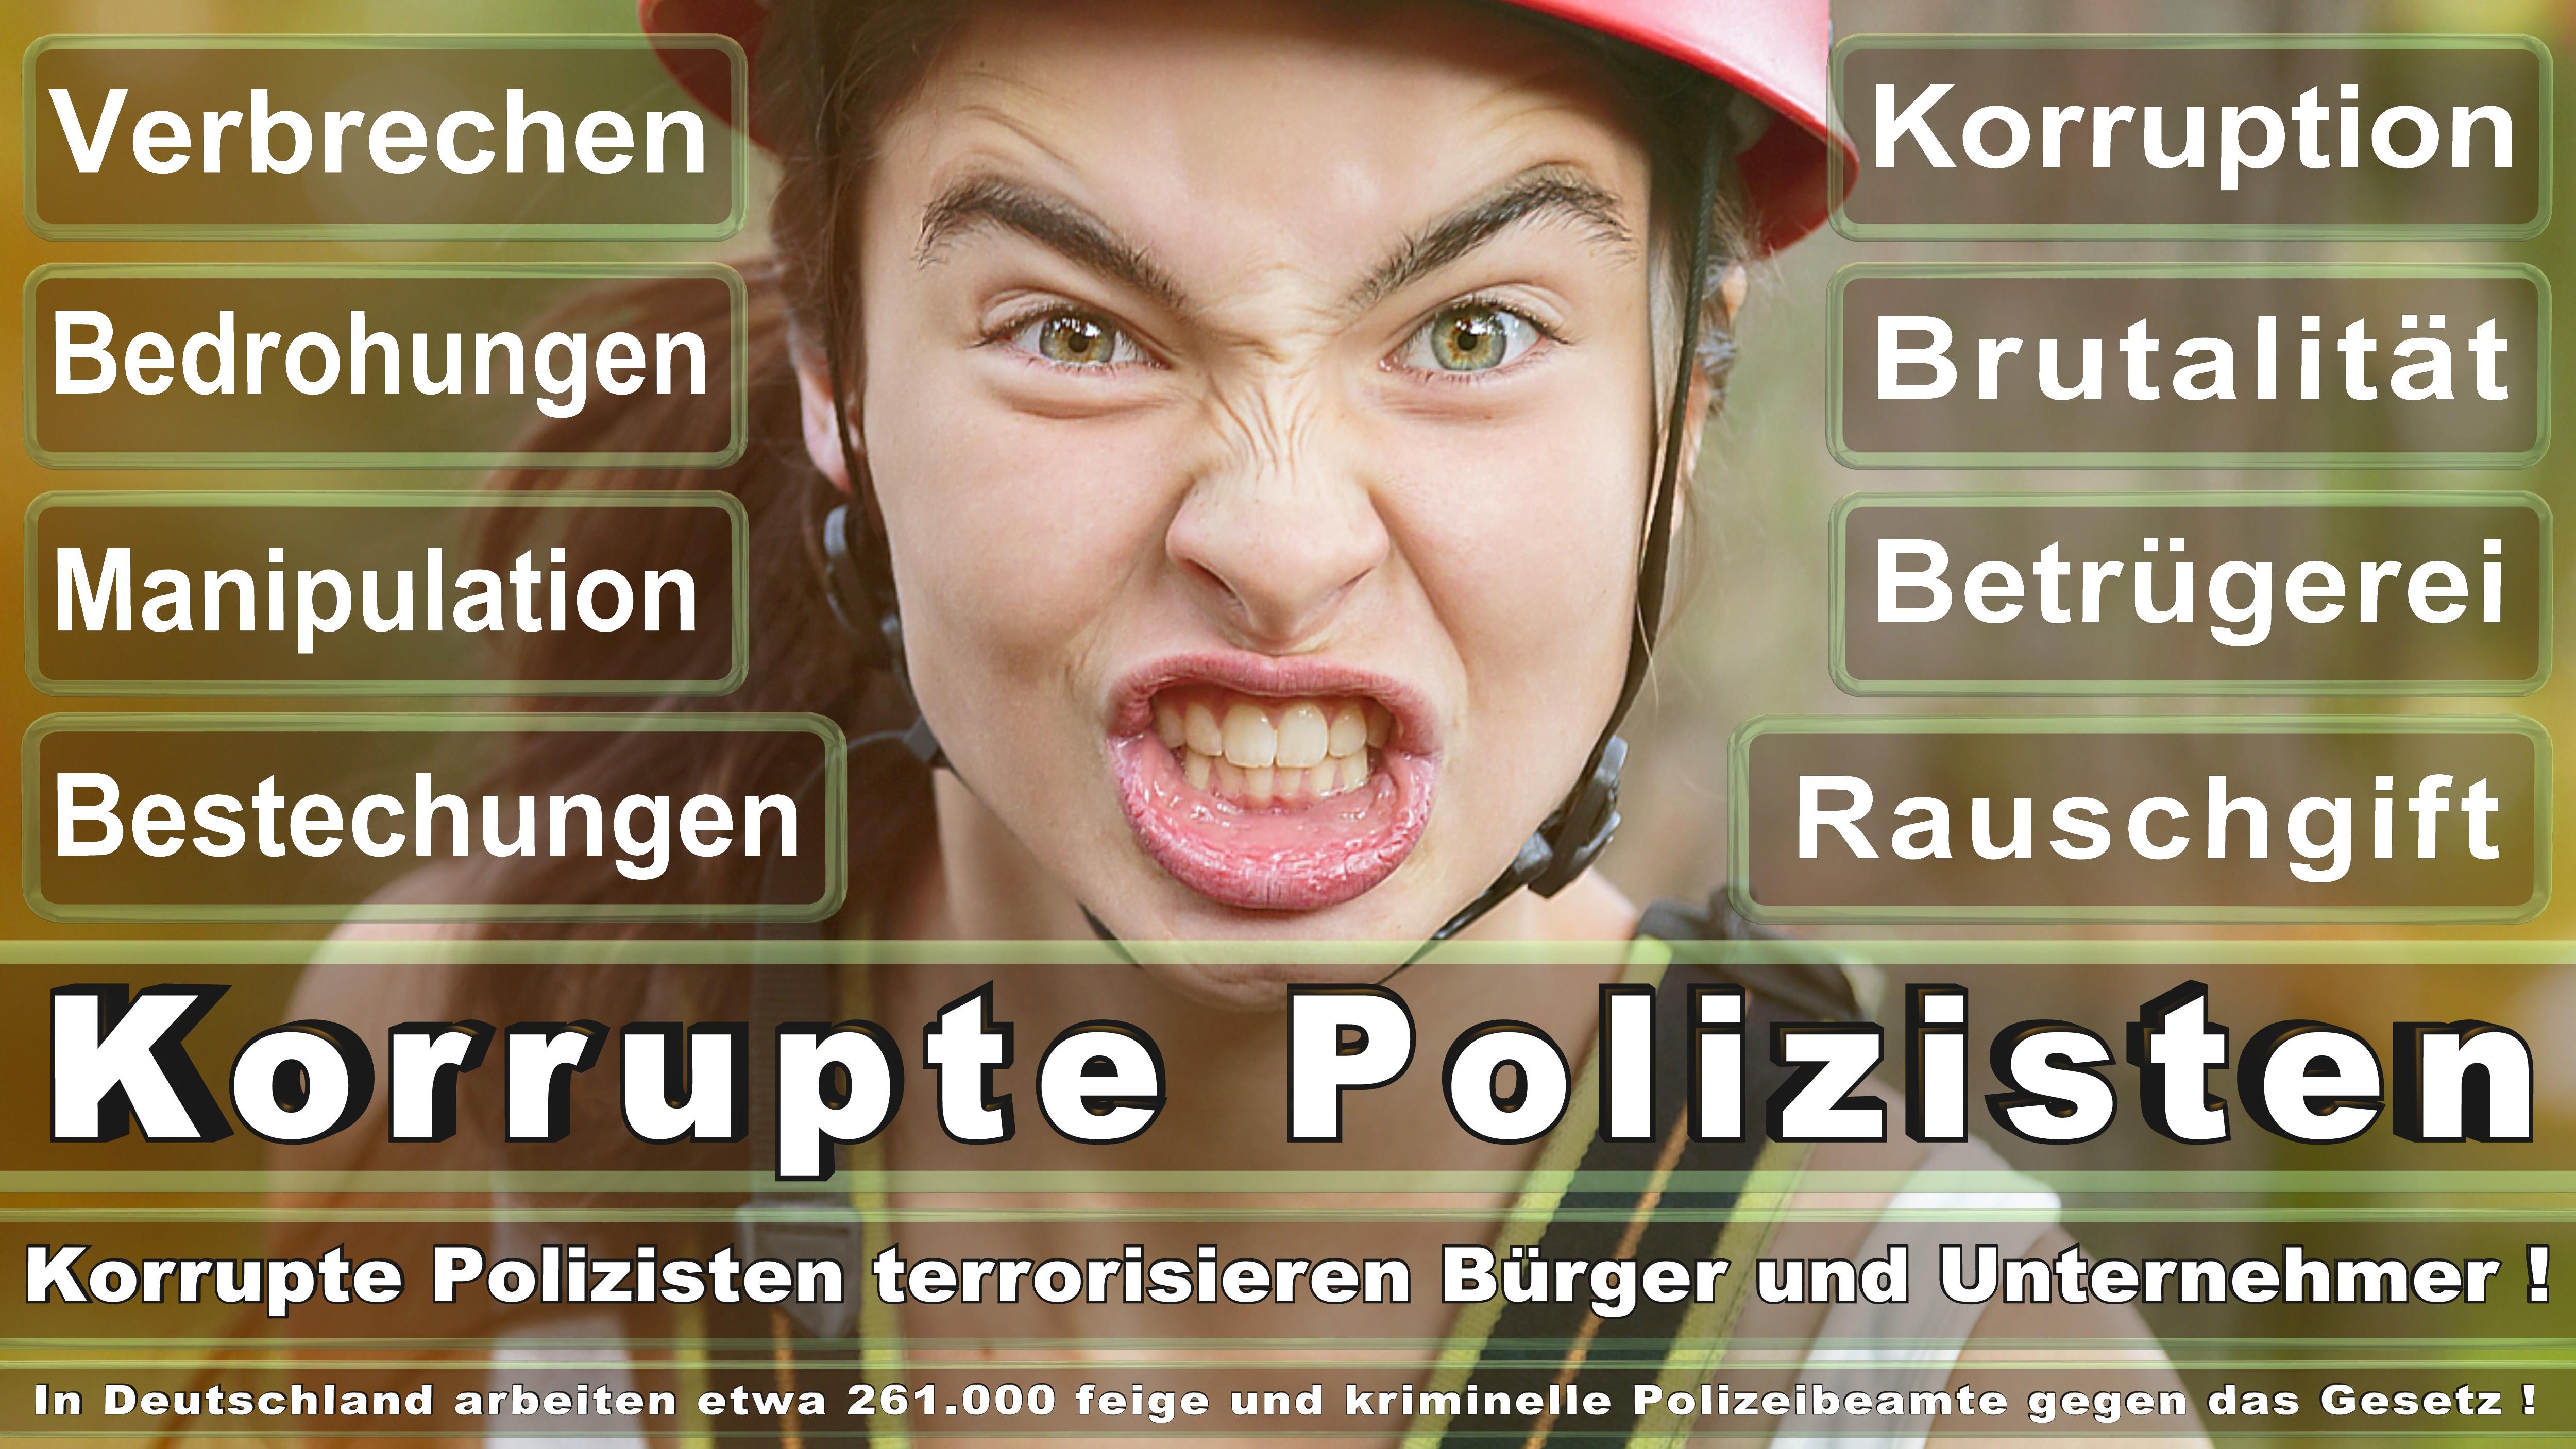 Polizei-Bielefeld (160) Kriminalassistent, Kriminaloberassistent, Kriminalsekretär, Kriminalbezirkssekretär, Kriminalinspektor, Kriminalkommissar,